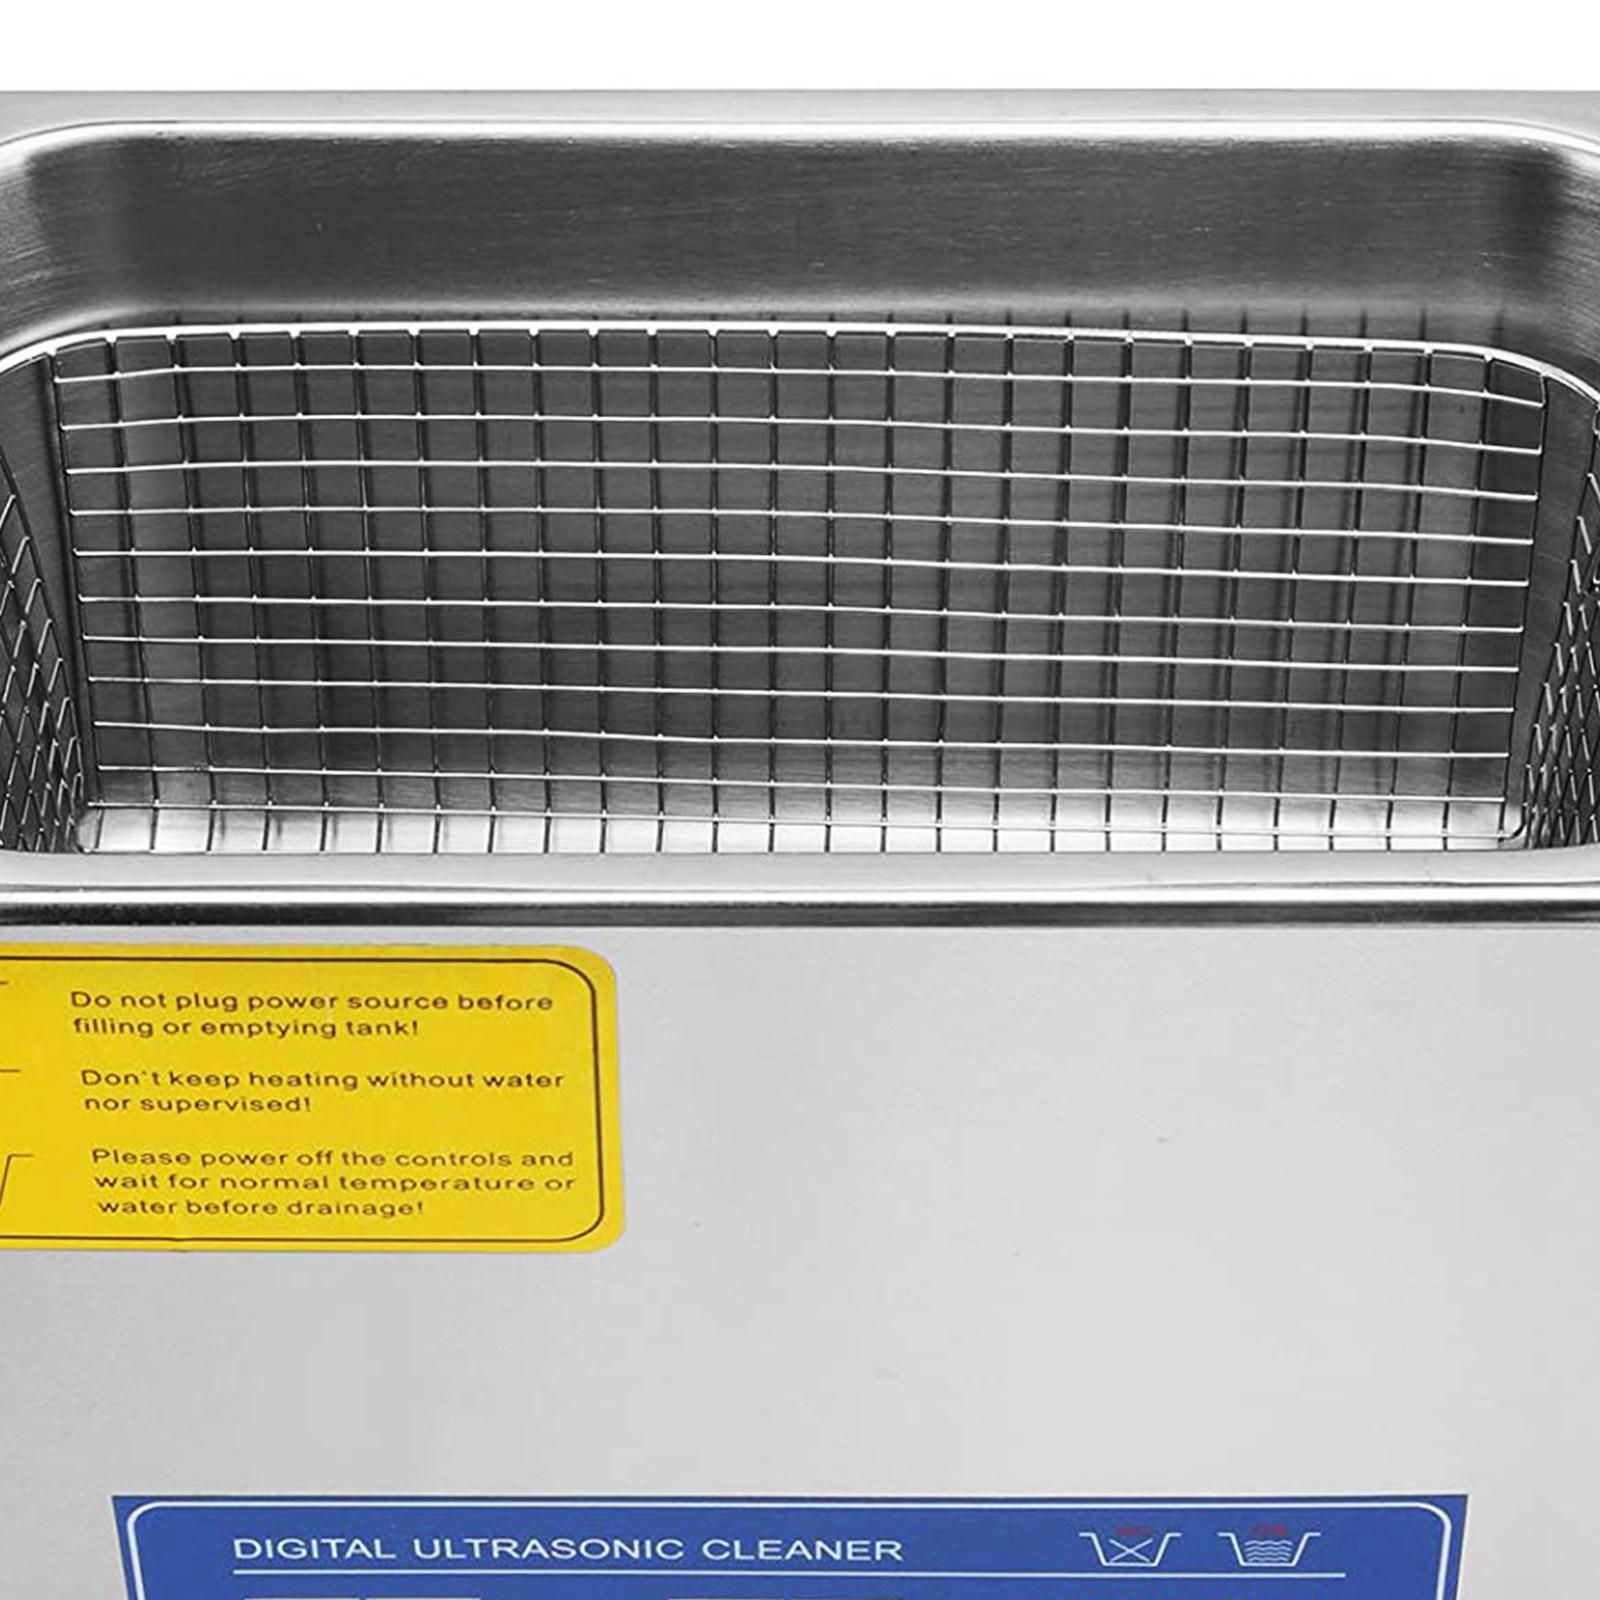 Vaschetta-Vasca-Ultrasuoni-Lavatrice-Pulitore-Ad-Ultrasuoni miniatura 67